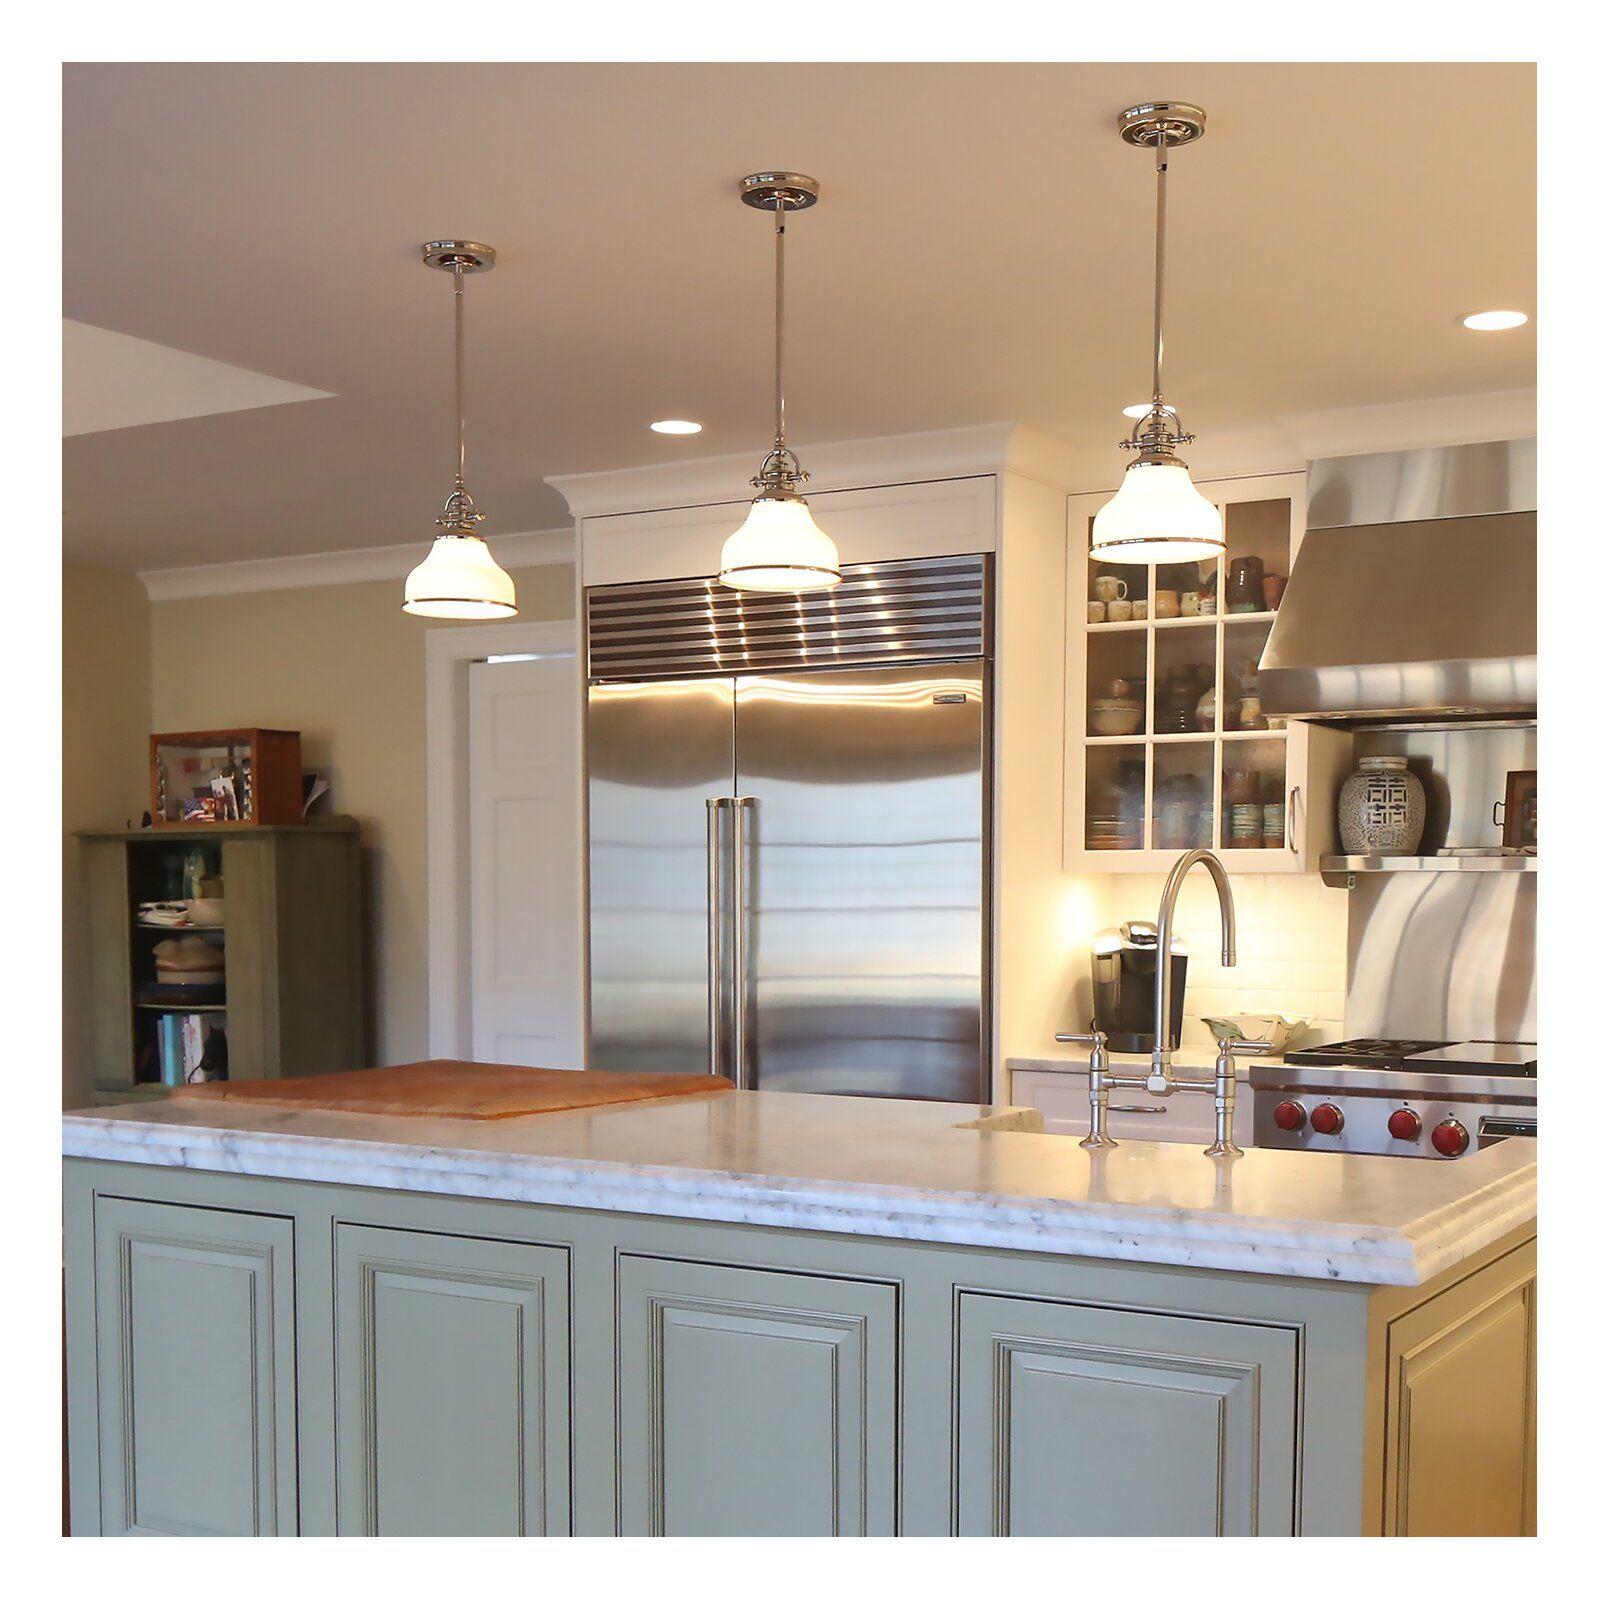 Macon 1-Light Single Bell Pendant In 2019 | House | Kitchen with regard to Macon 1-Light Single Dome Pendants (Image 21 of 30)